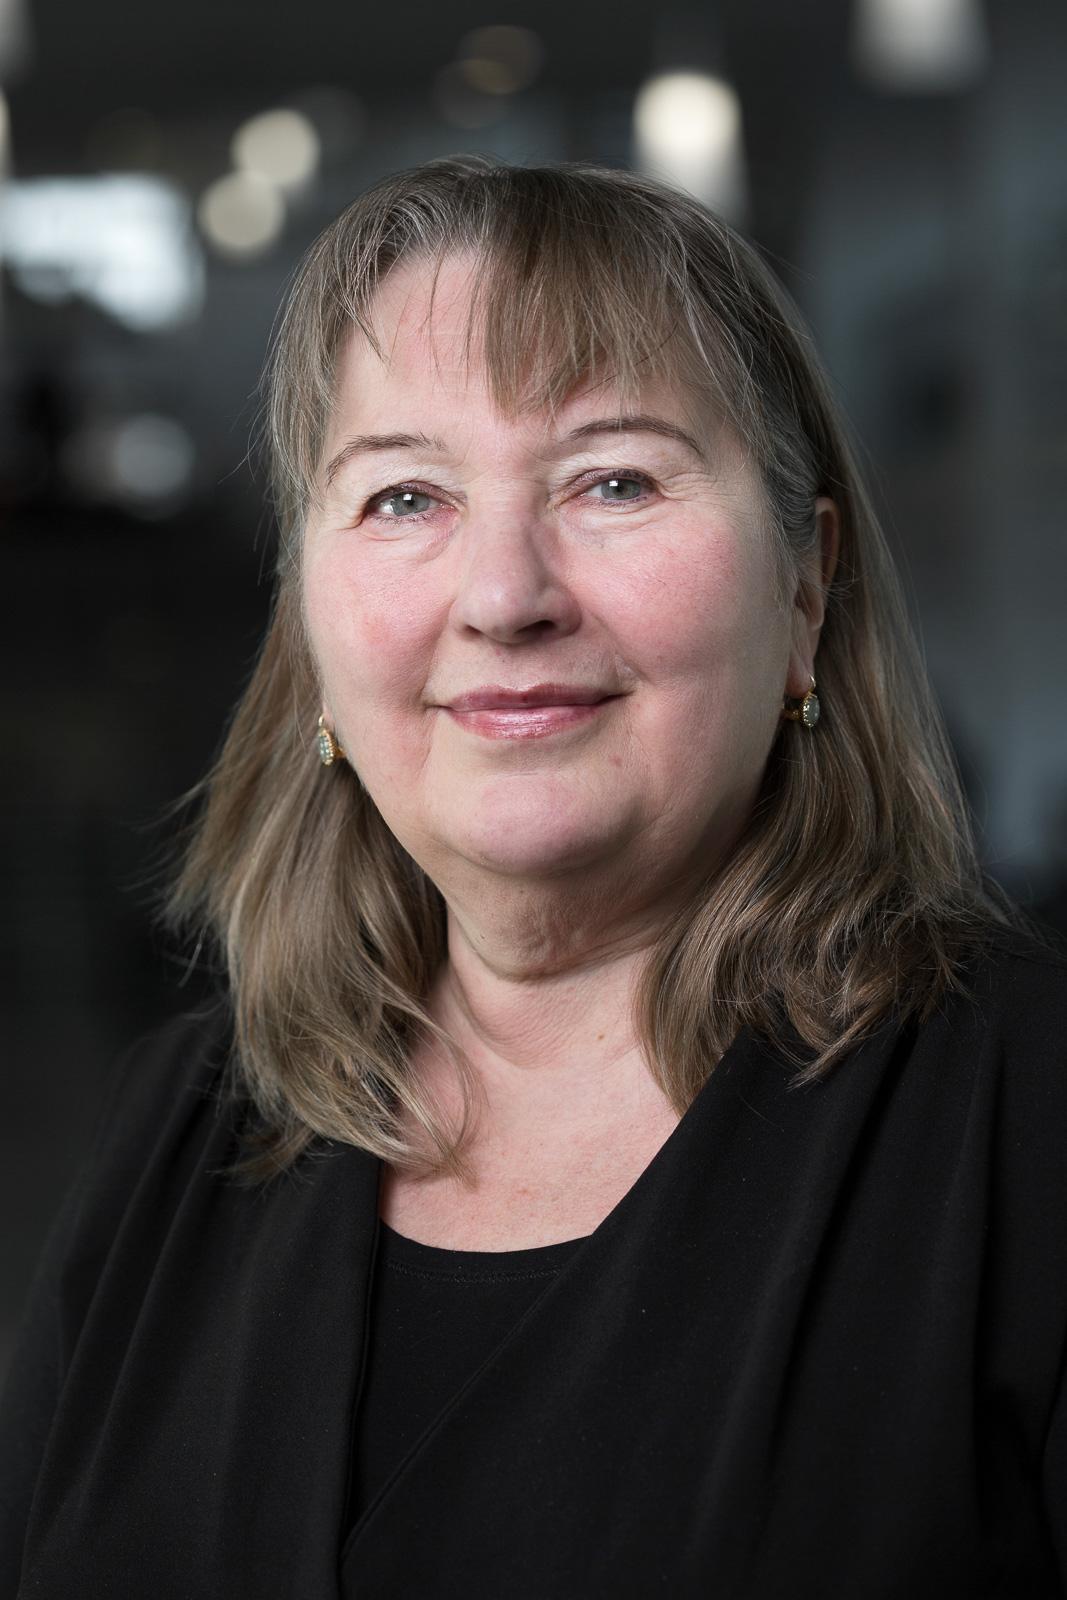 Christa Thomsen